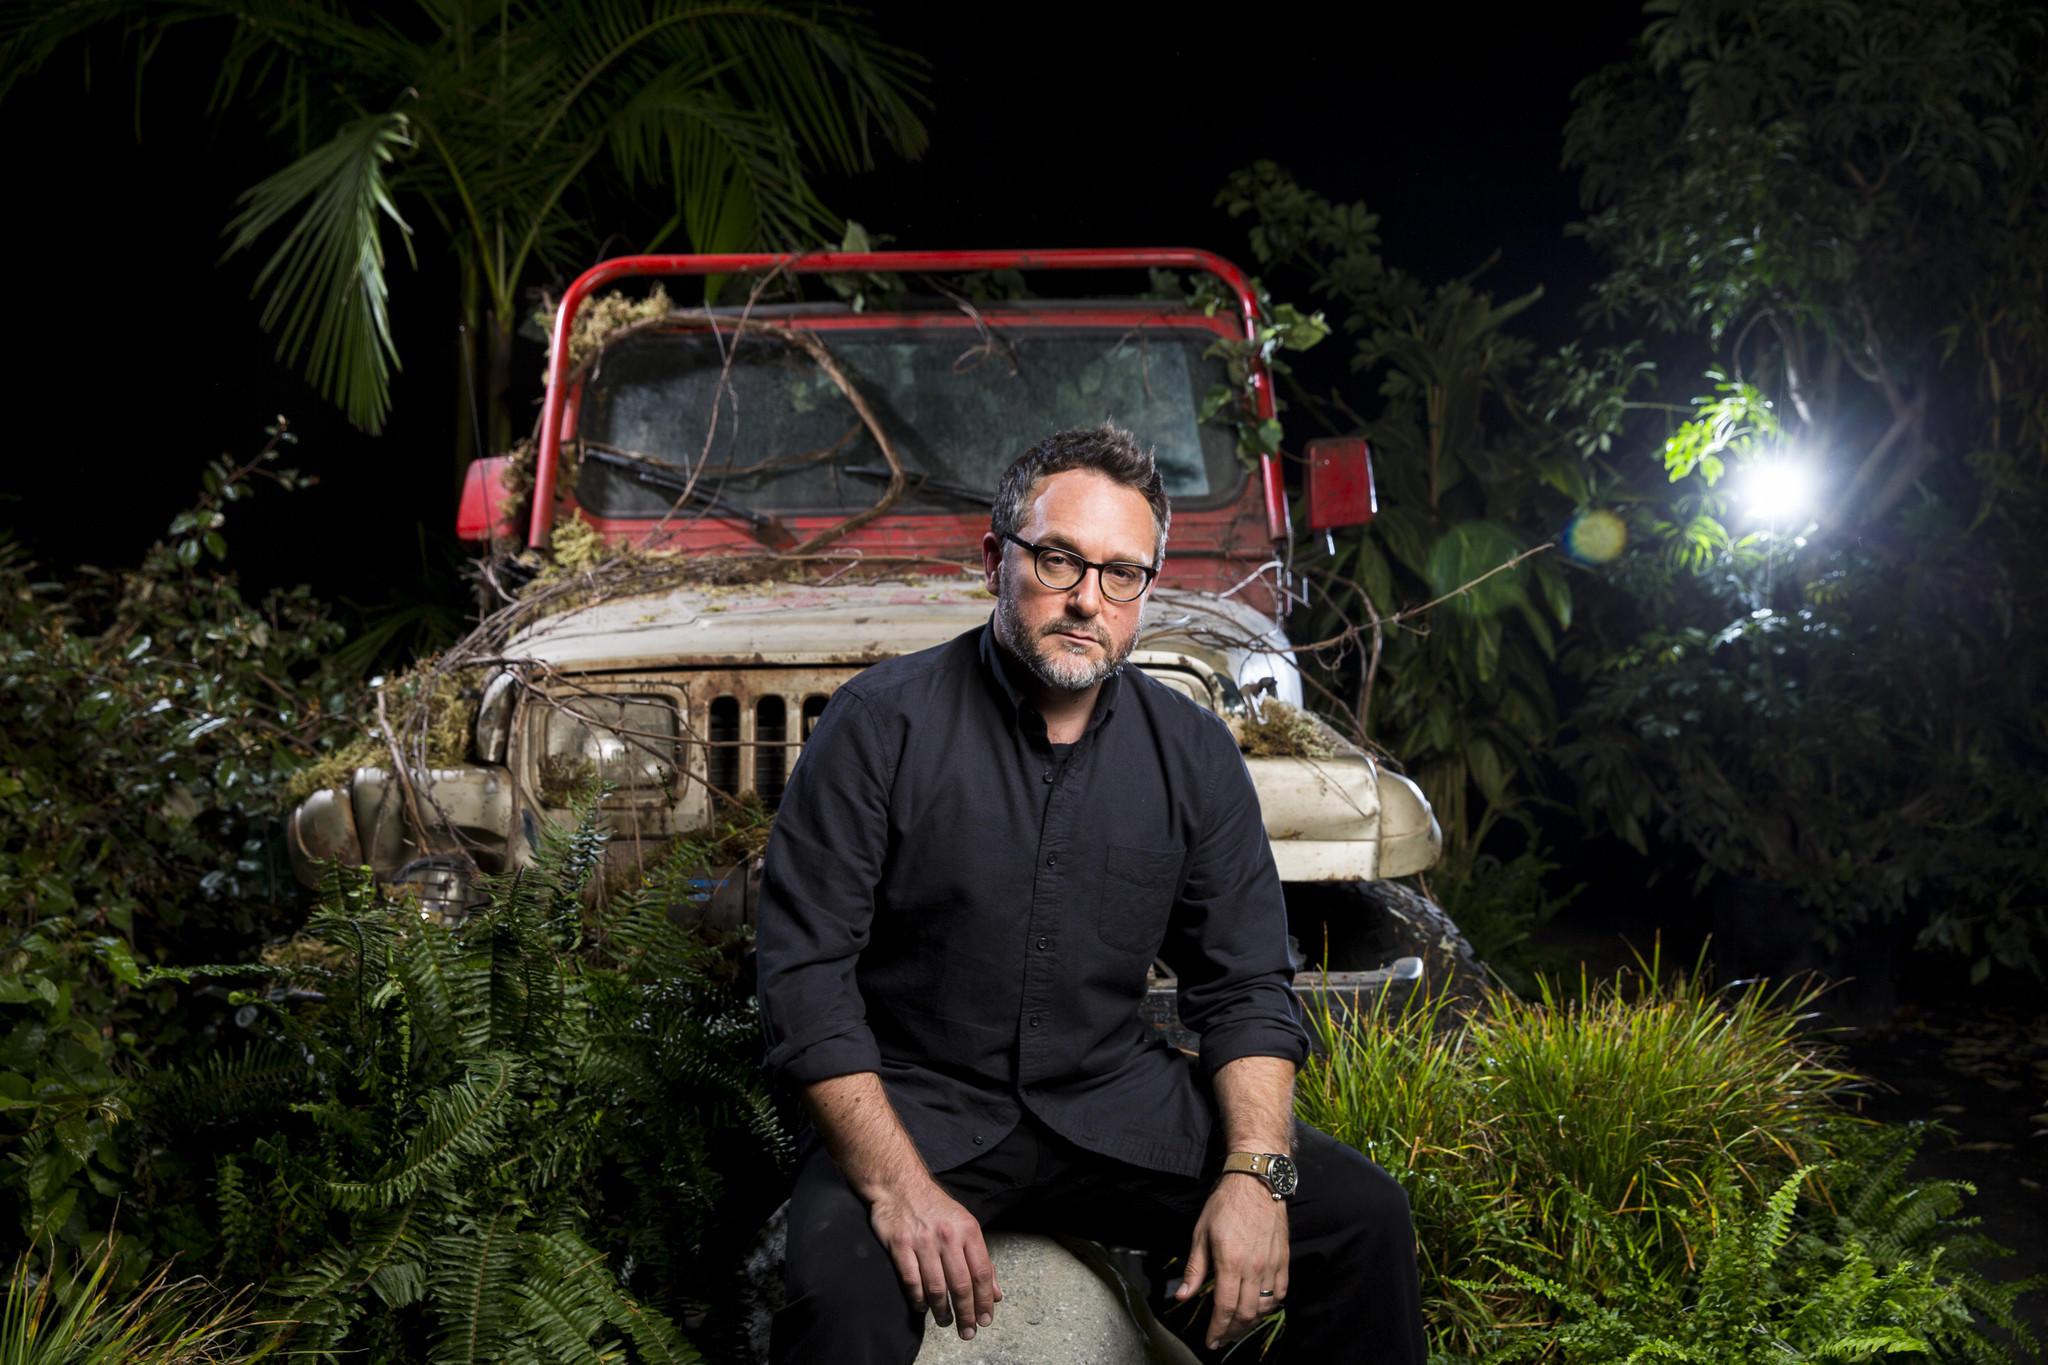 """Jurassic World"" director Colin Trevorrow will no longer helm ""Star Wars: Episode IX."" (Jay L. Clendenin / Los Angeles Times)"